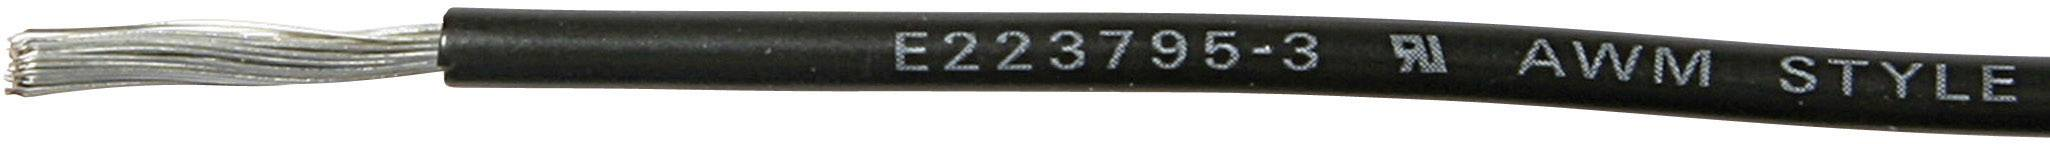 Opletenie / lanko MediKabel 120180 1 x 0.90 mm², vonkajší Ø 2.15 mm, metrový tovar, čierna